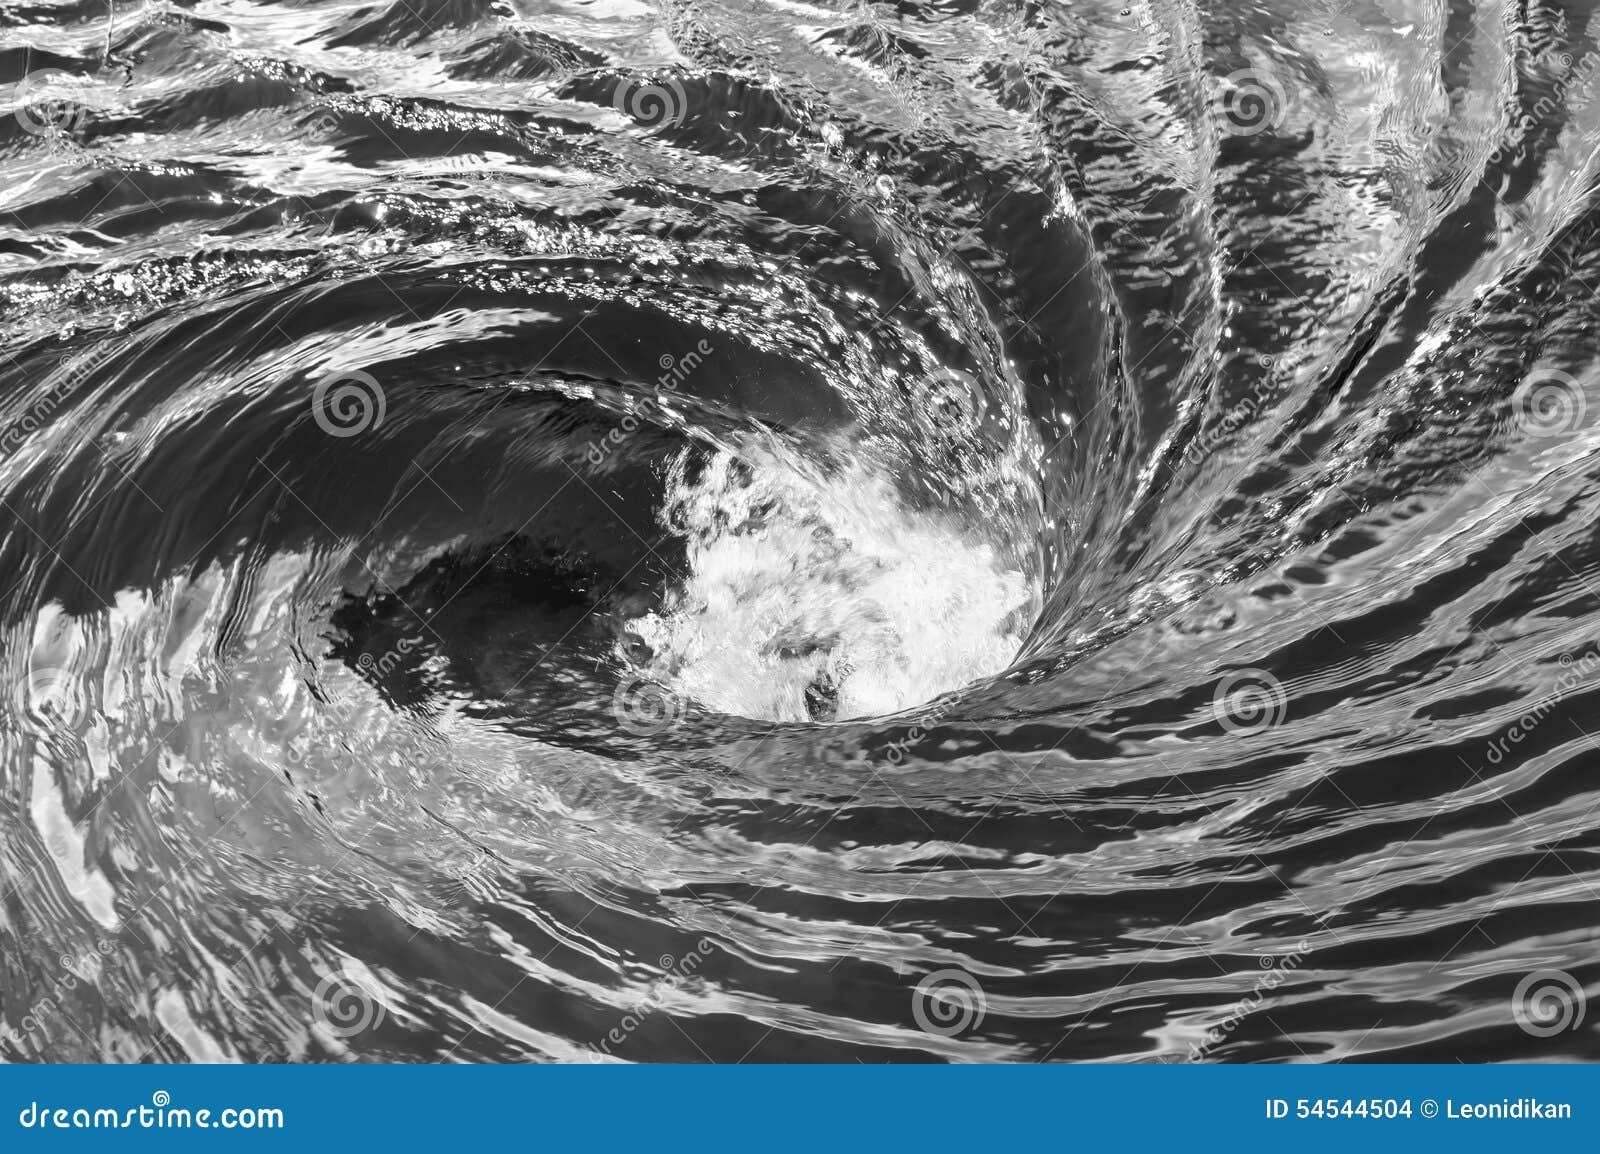 The Raging Whirlpool Stock Photo Image 54544504